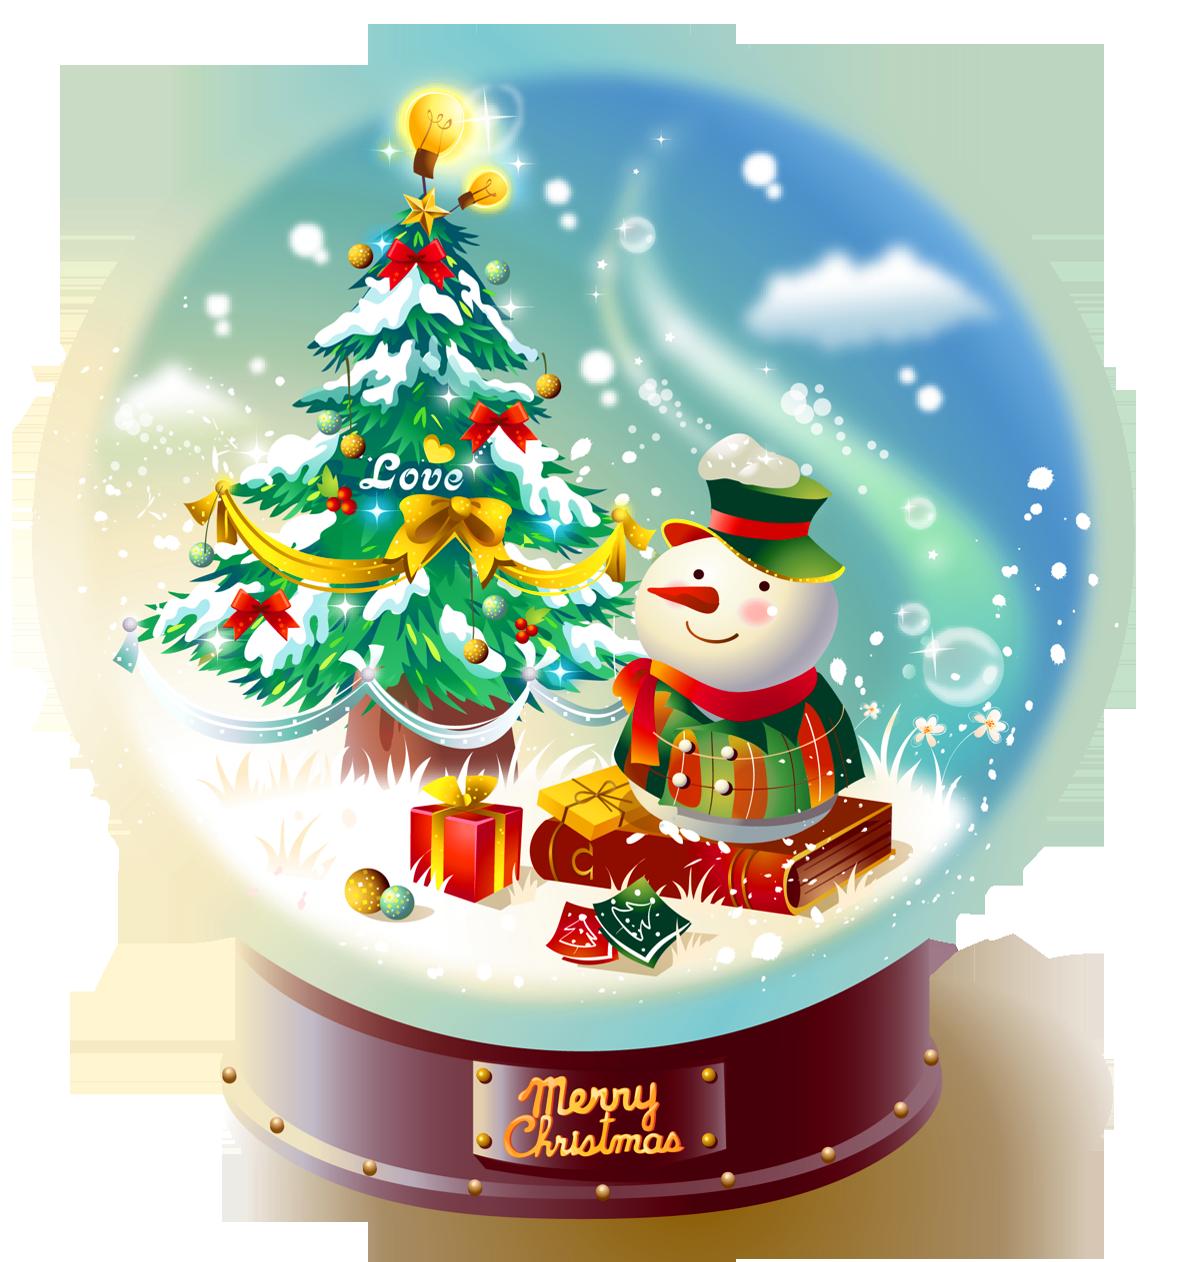 Transparent Christmas Snowglobe With Snowman Png Picture Christmas Snow Globes Snow Globes Christmas